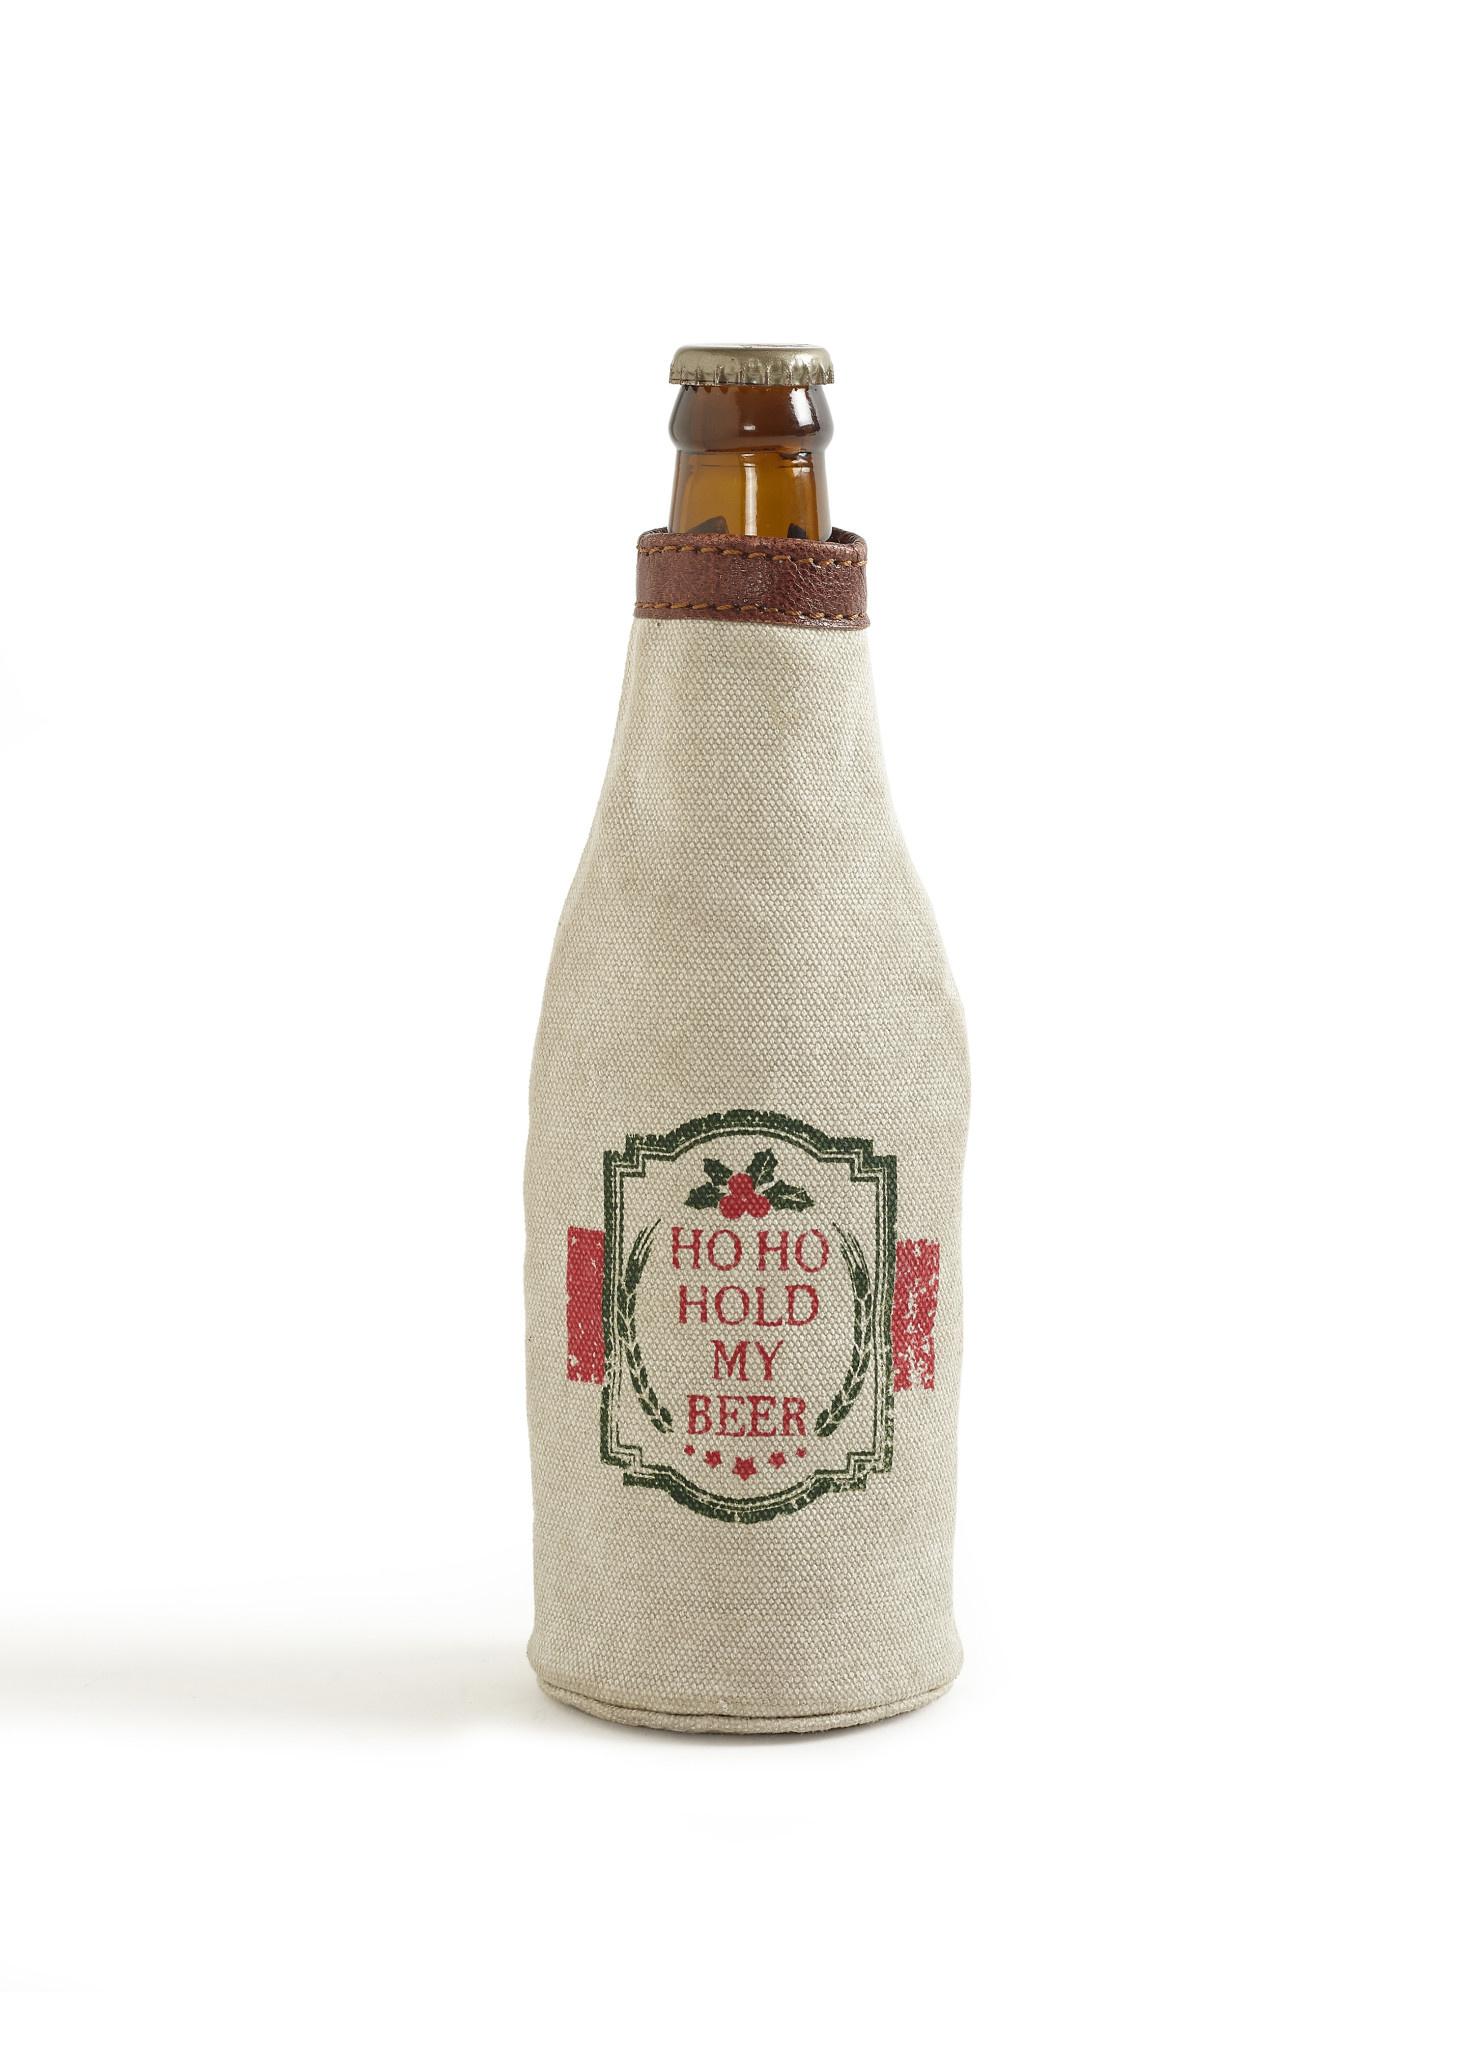 Mona B Ho Ho Hold My Beer Bottle Koozie